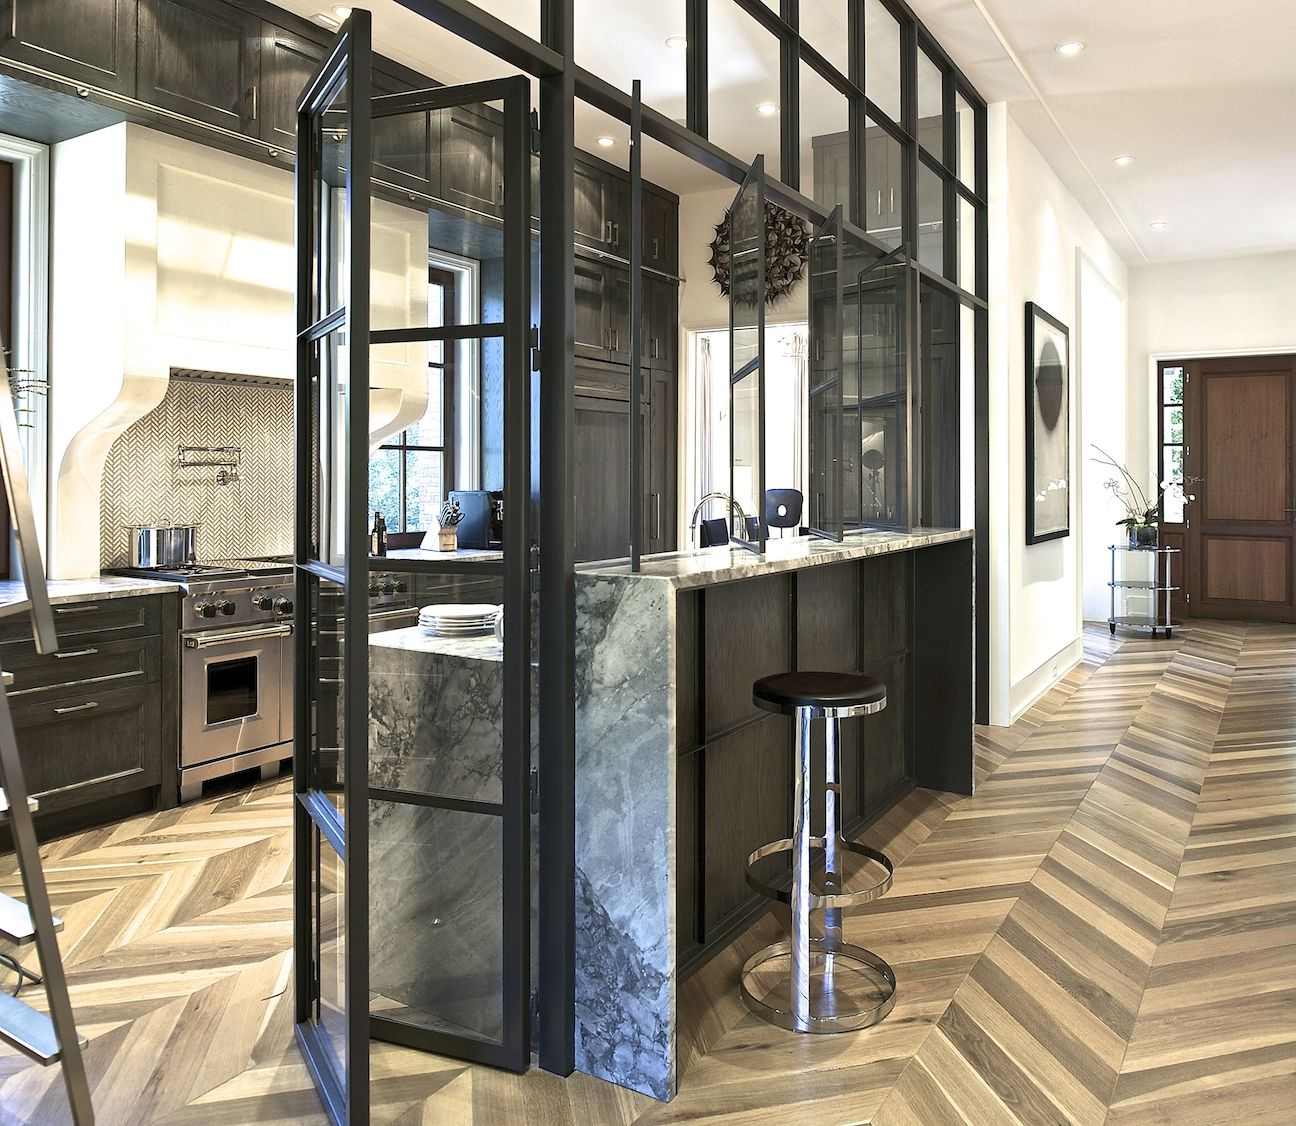 Interior Design Blog – Design, Art, Travel, Style Inspiratio…